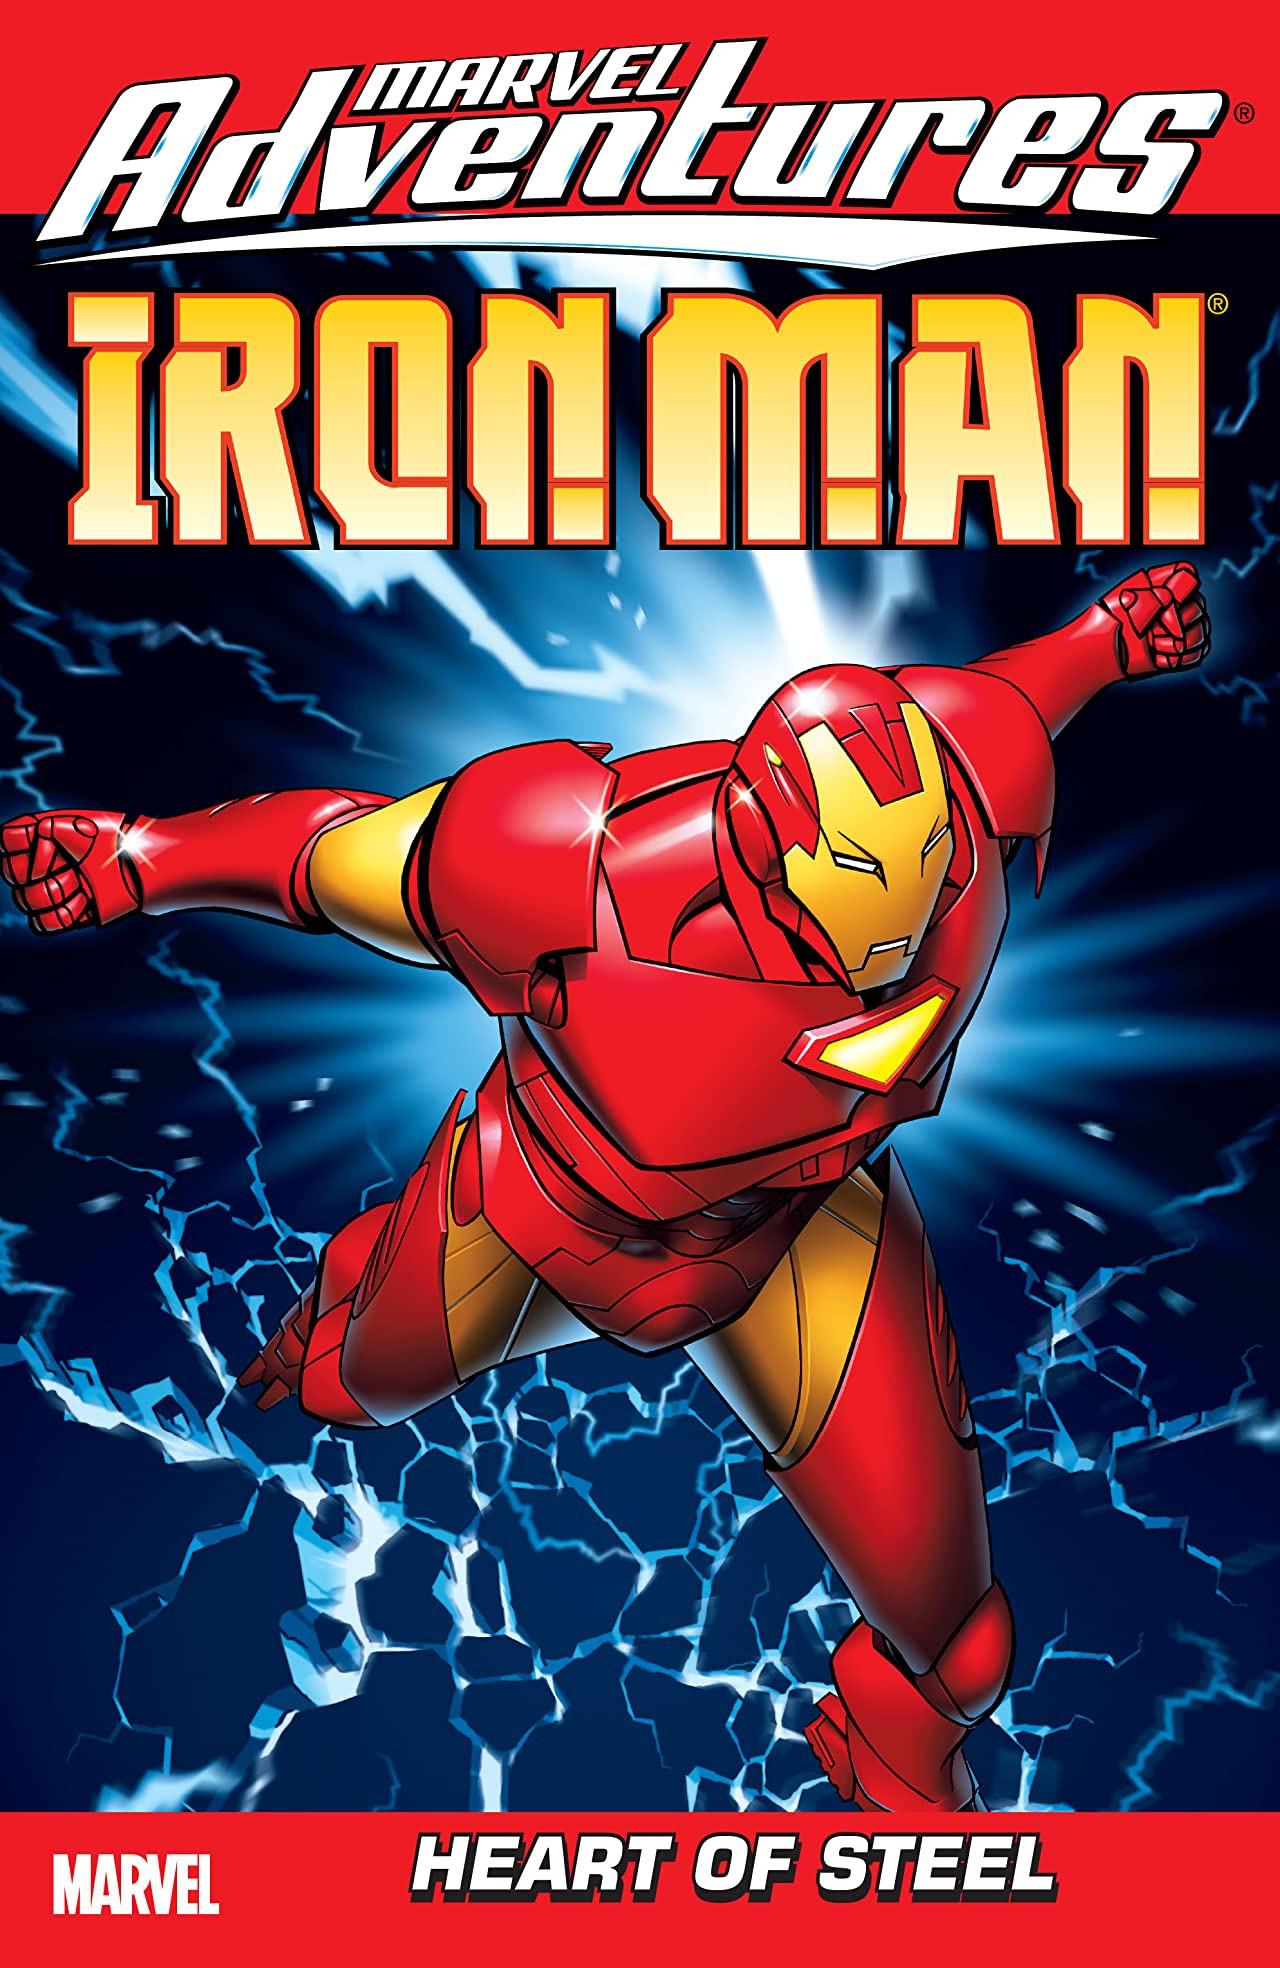 Marvel Adventures Iron Man TPB Vol 1 1: Heart of Steel